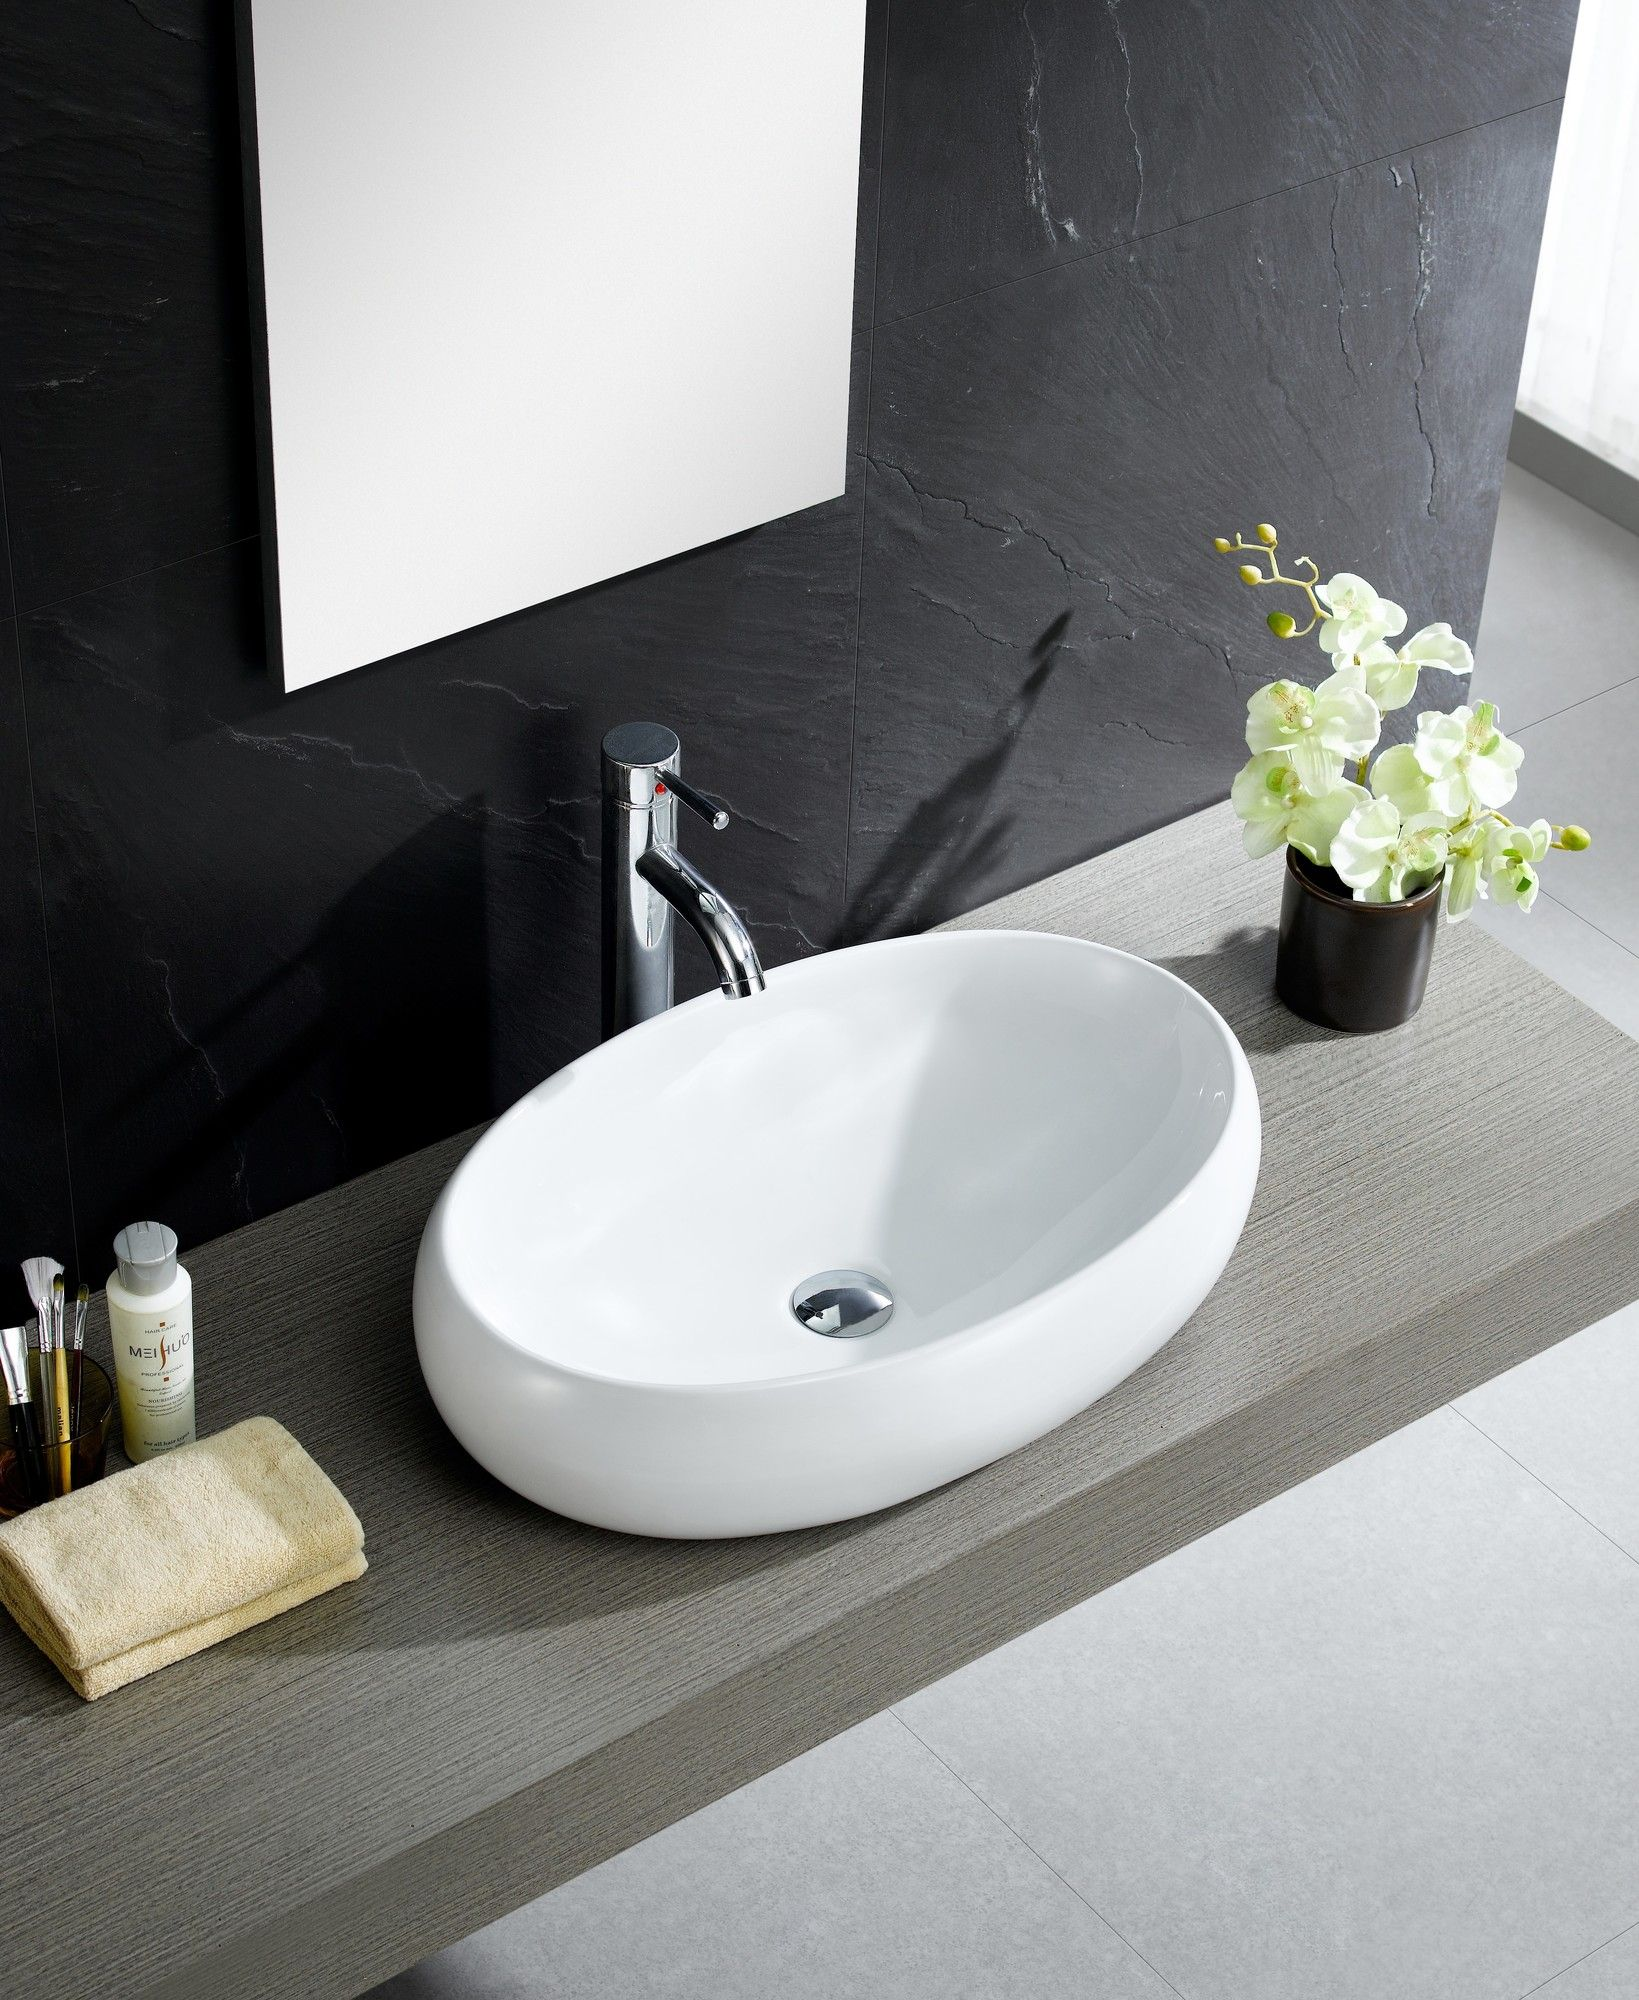 Modern Vitreous China Bulging Oval Vessel Sink Vessel Bathroom